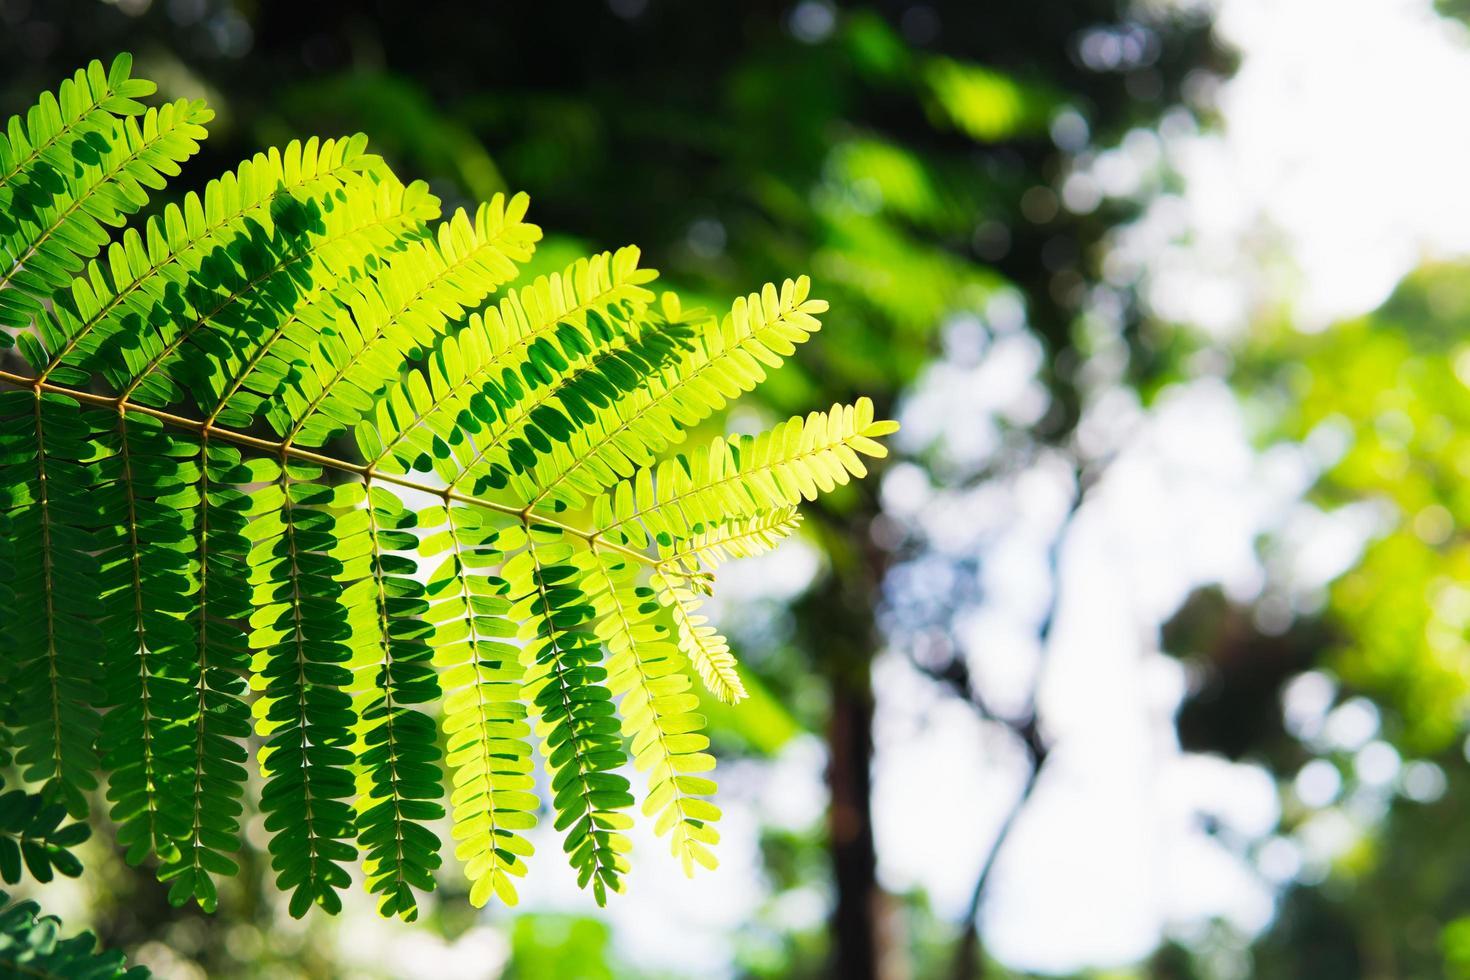 Close-up of fern leaf photo